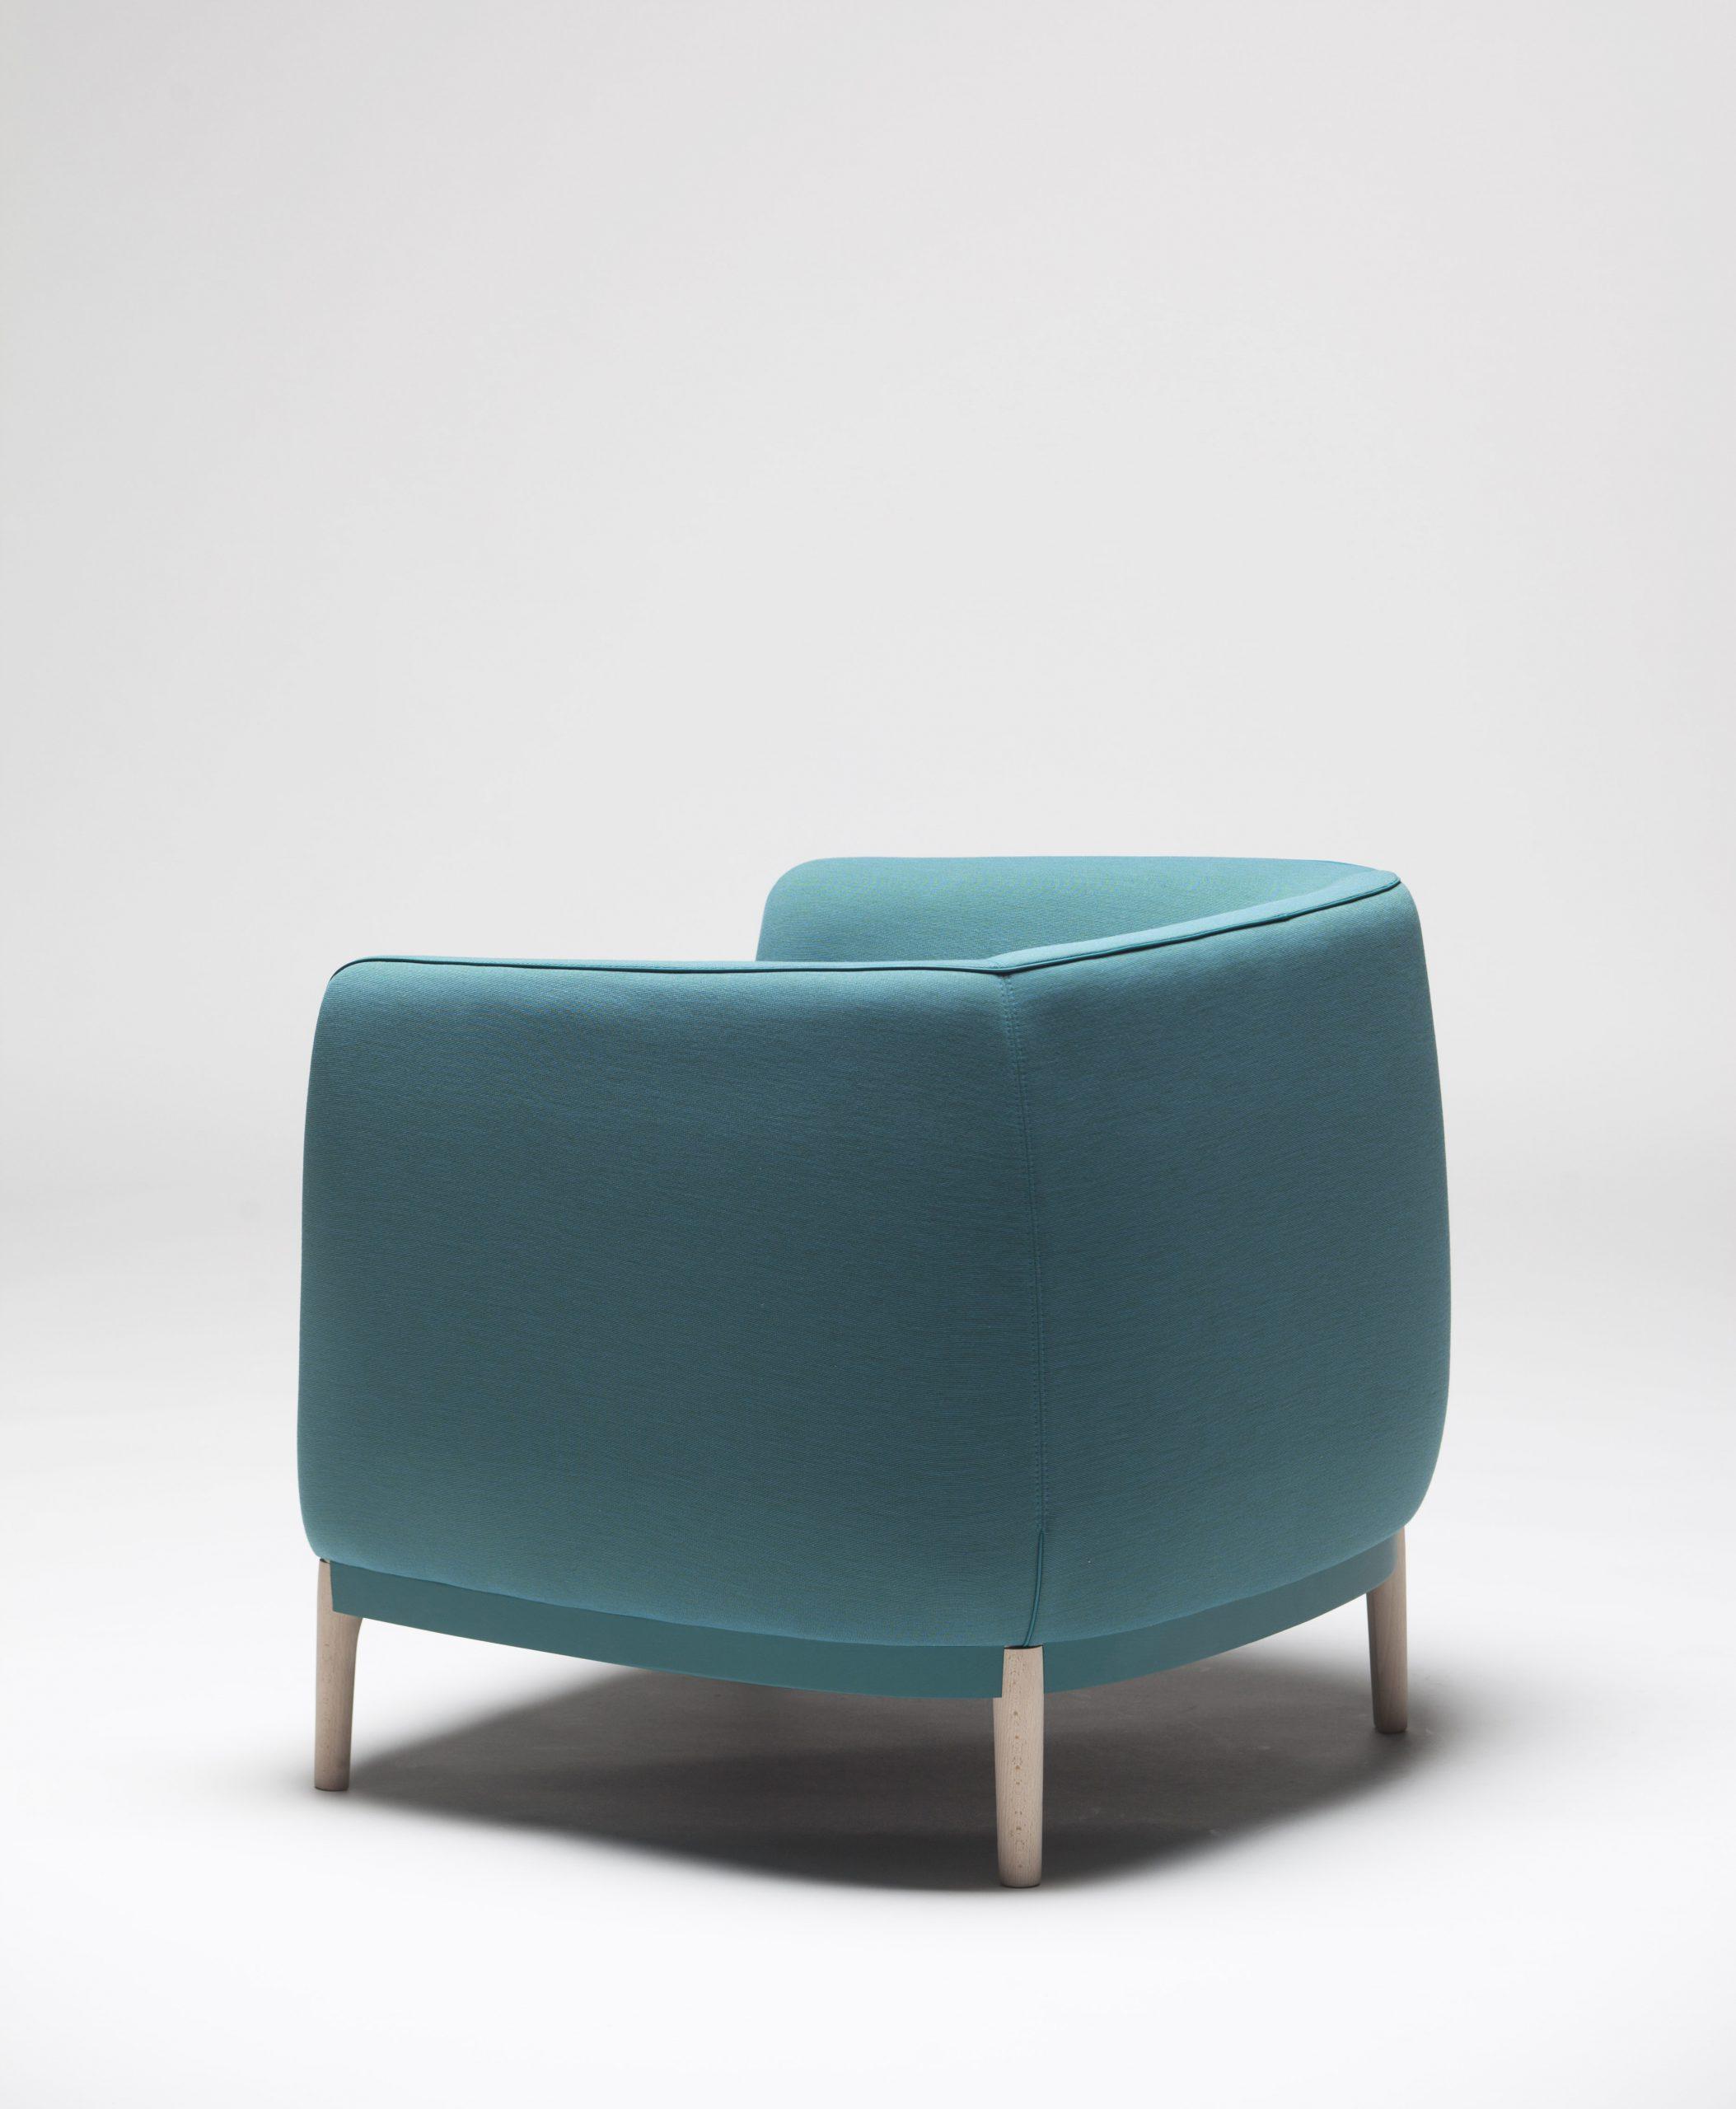 Cape lounge chair by Debiasi Sandri for Tekhne